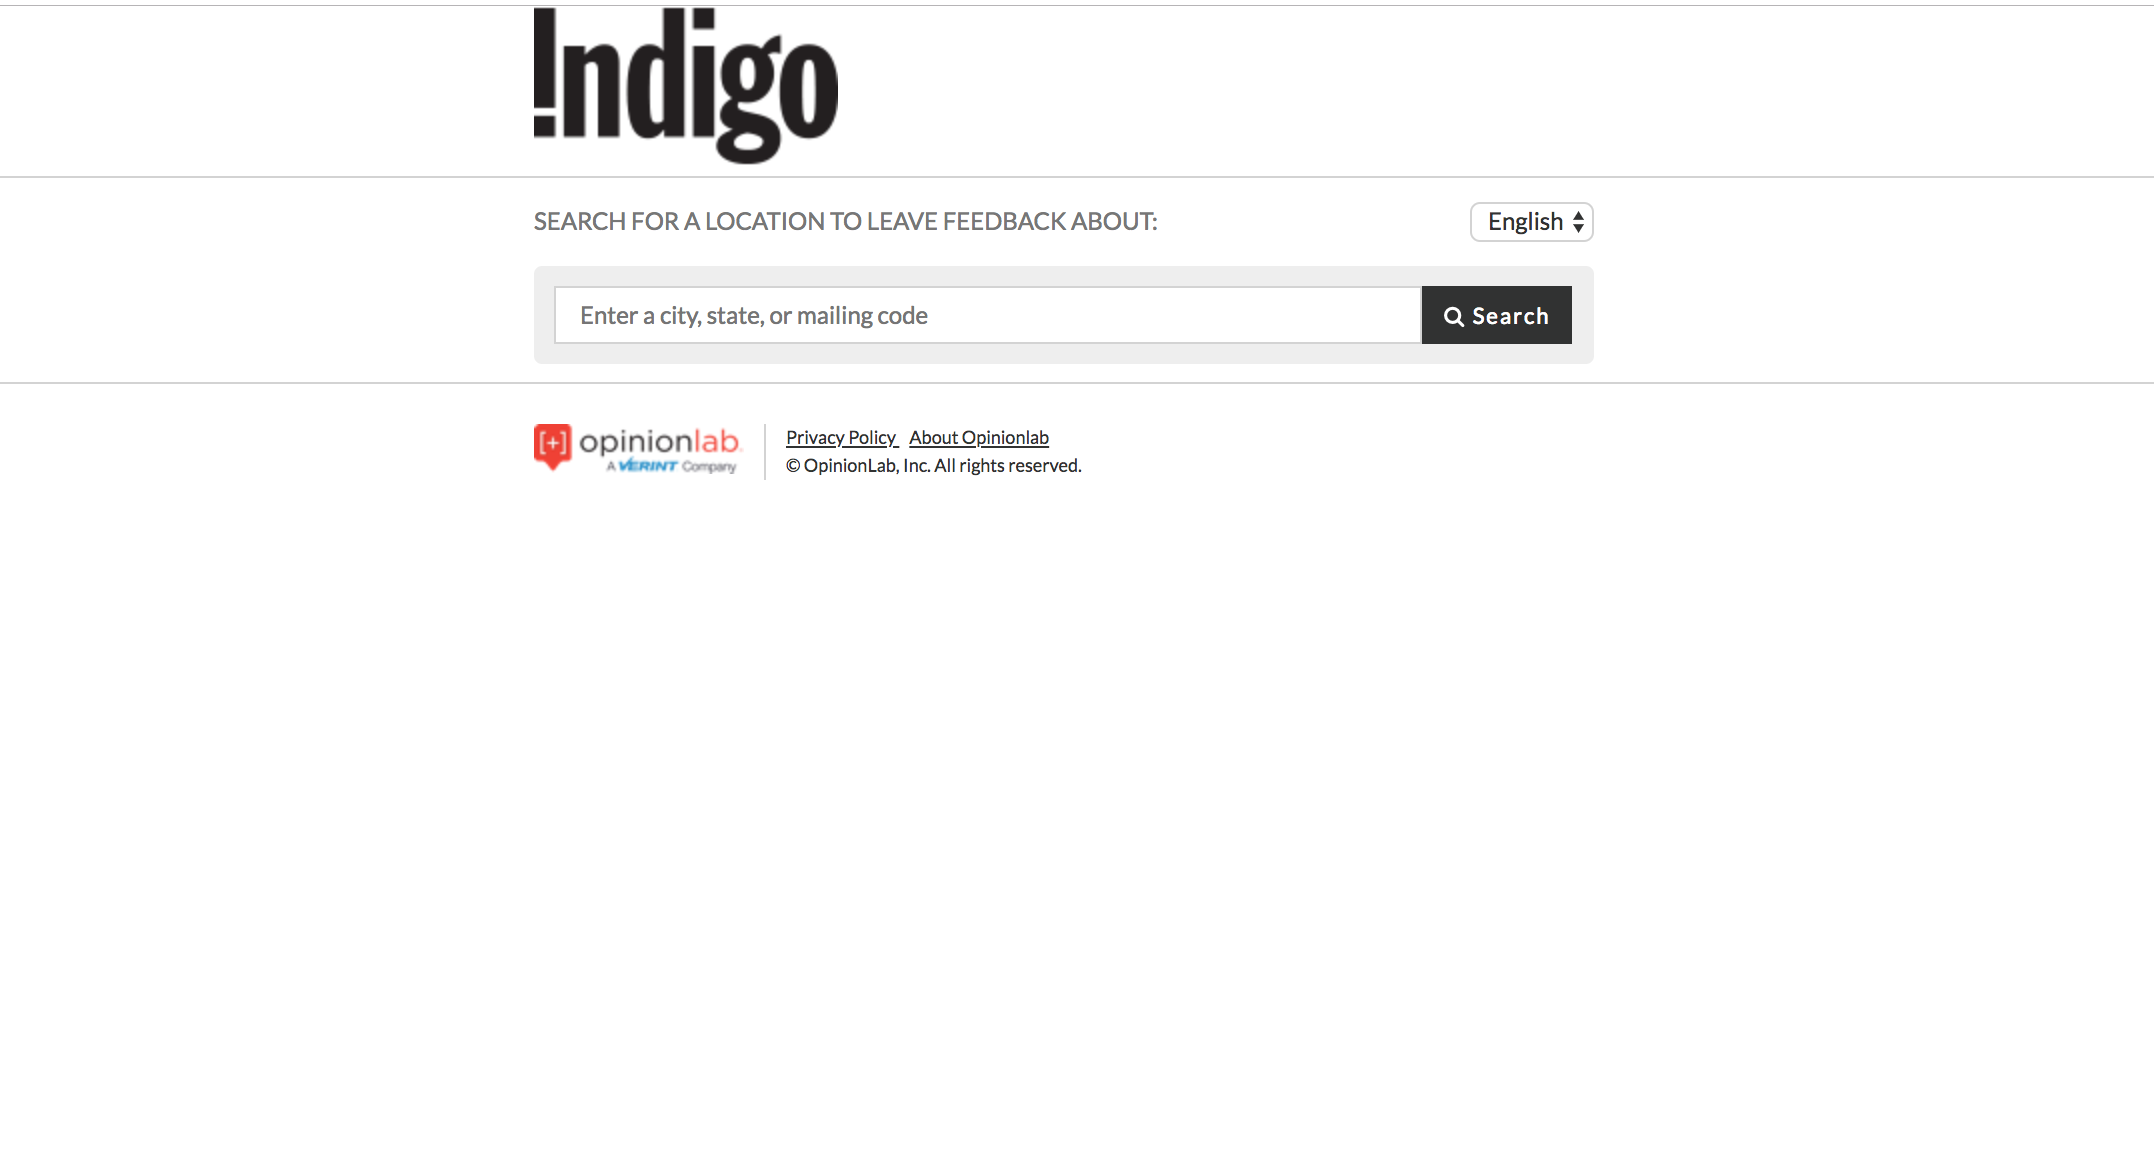 www.indigofeedback.com